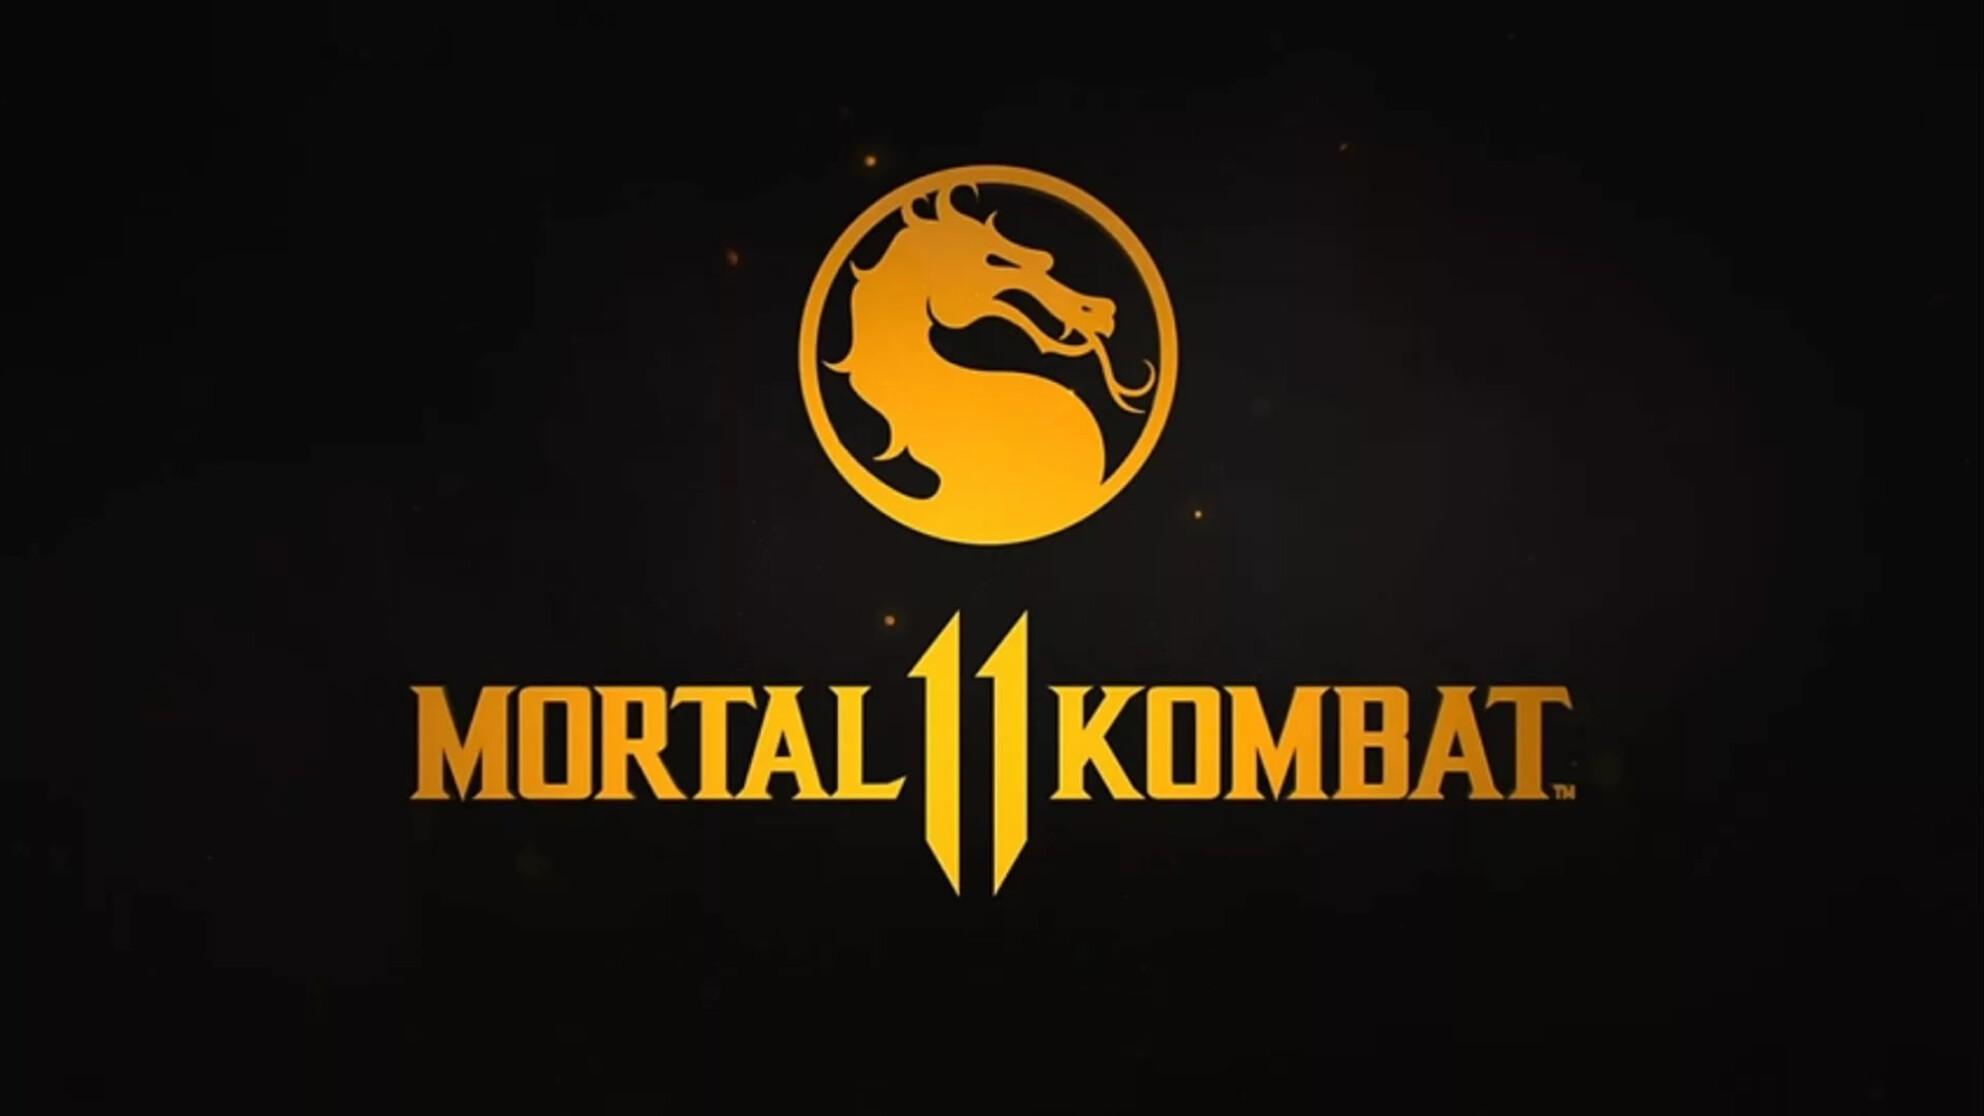 Mortal Kombat 11 version 1.14 patch notes